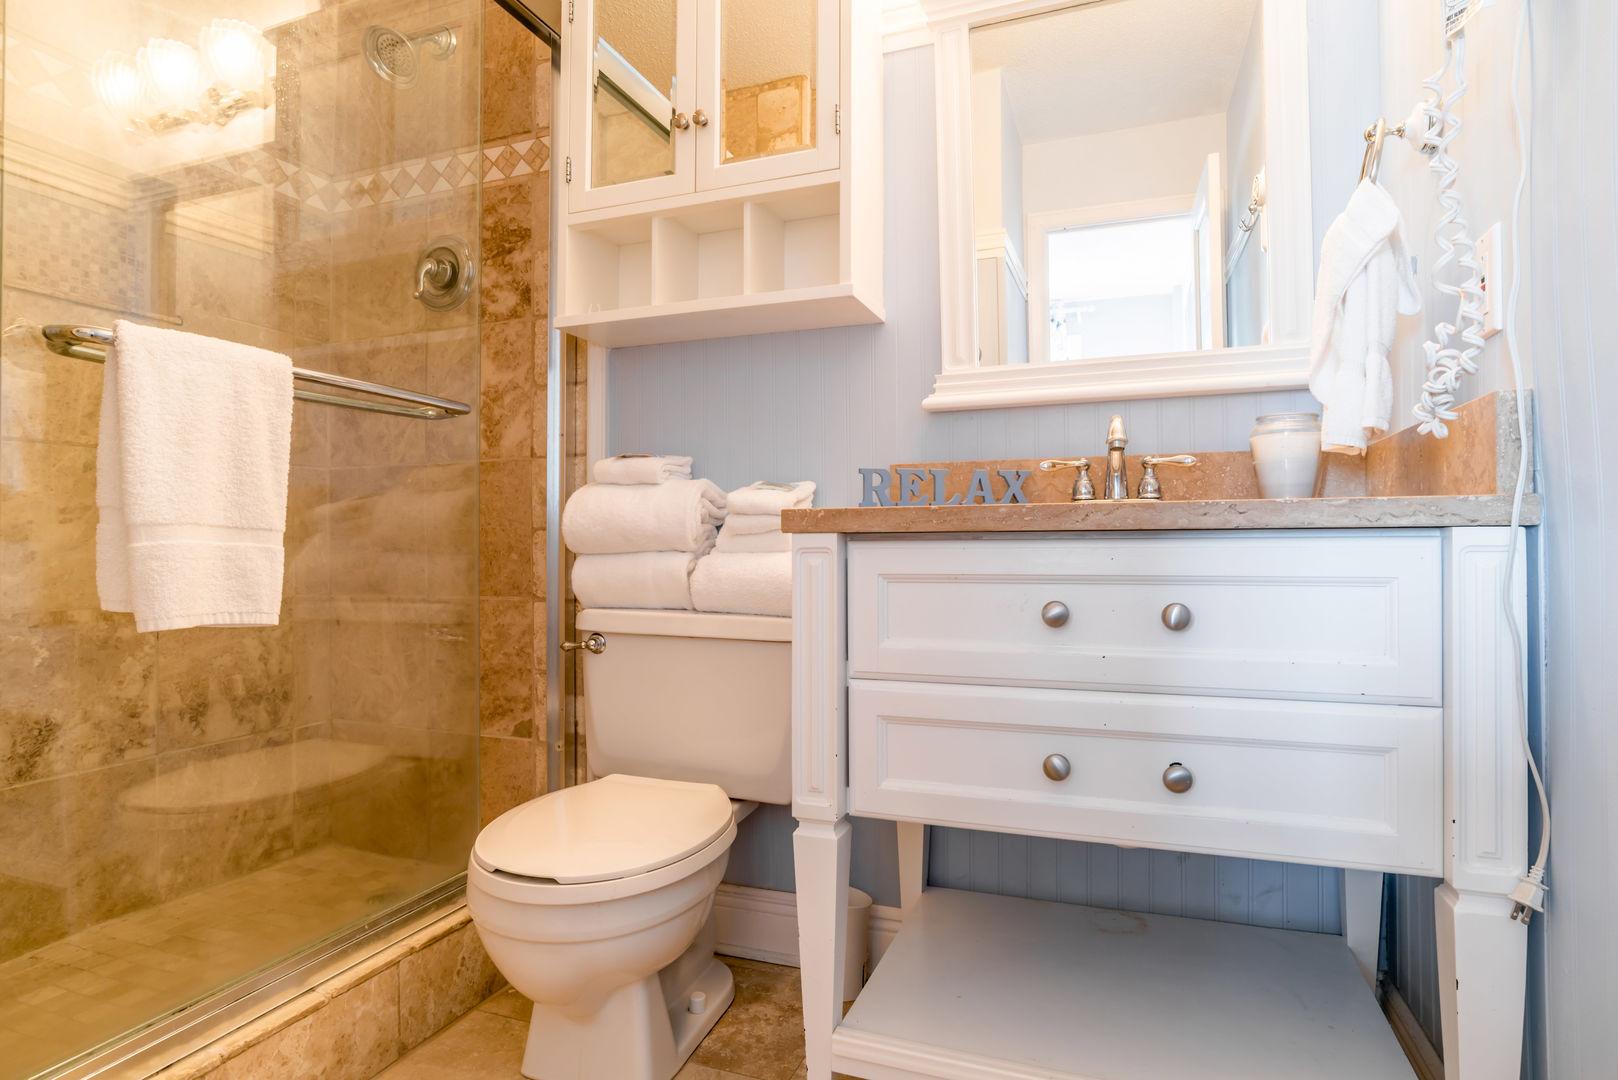 Master Bathroom Has A Walk-In Shower, toilet, and vanity sink.